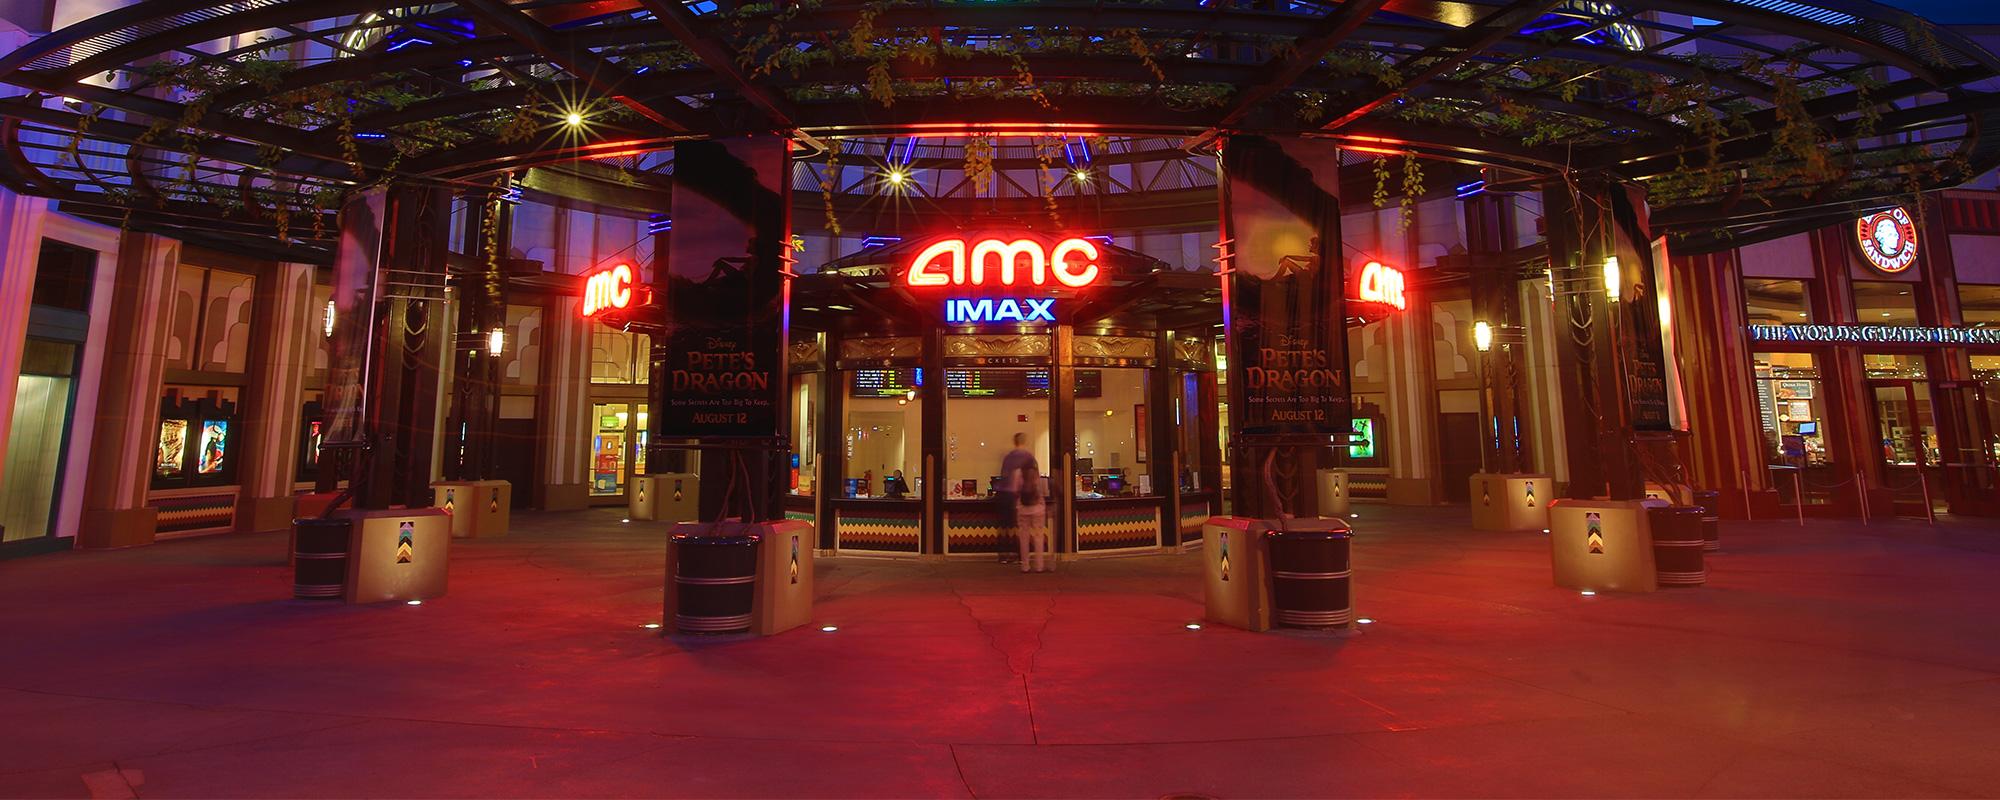 AMC Downtown Disney 12 Has Closed